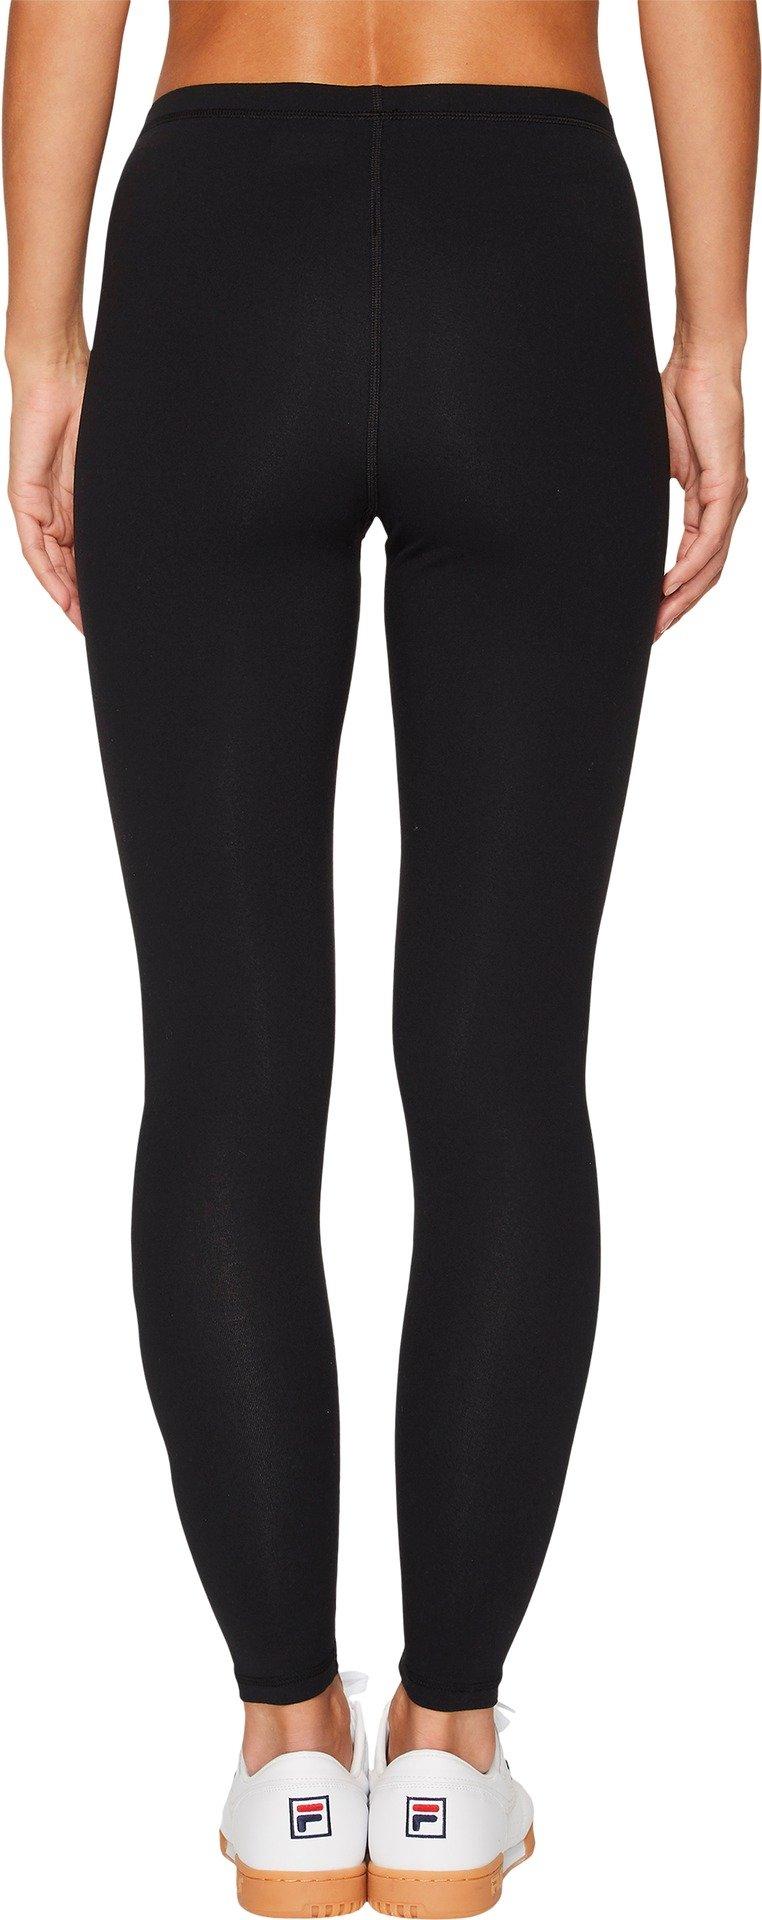 Fila Women's Karlie Tight Pants, Black, S by Fila (Image #2)